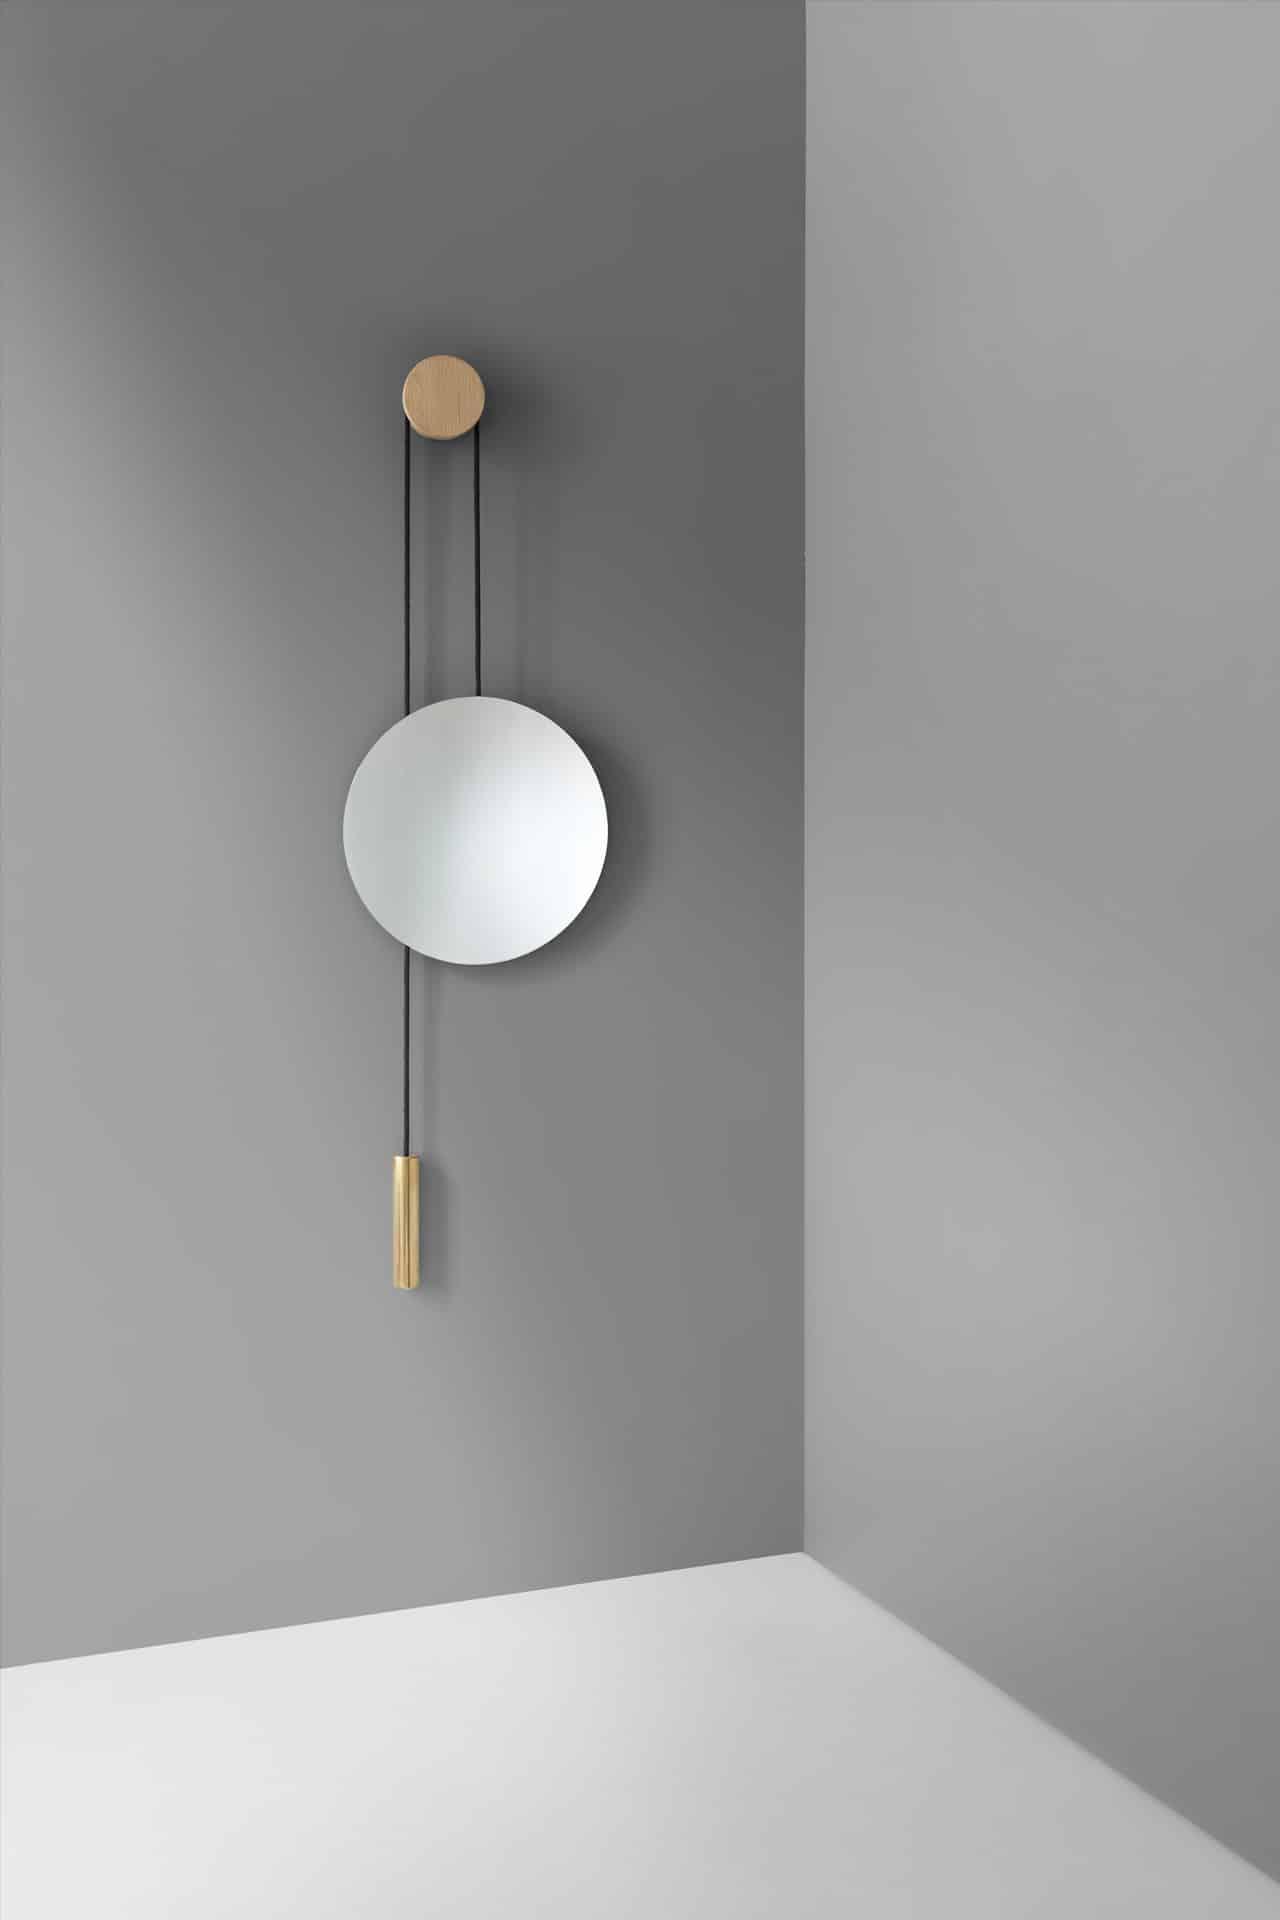 new_works_maison_et_objet_2016_3